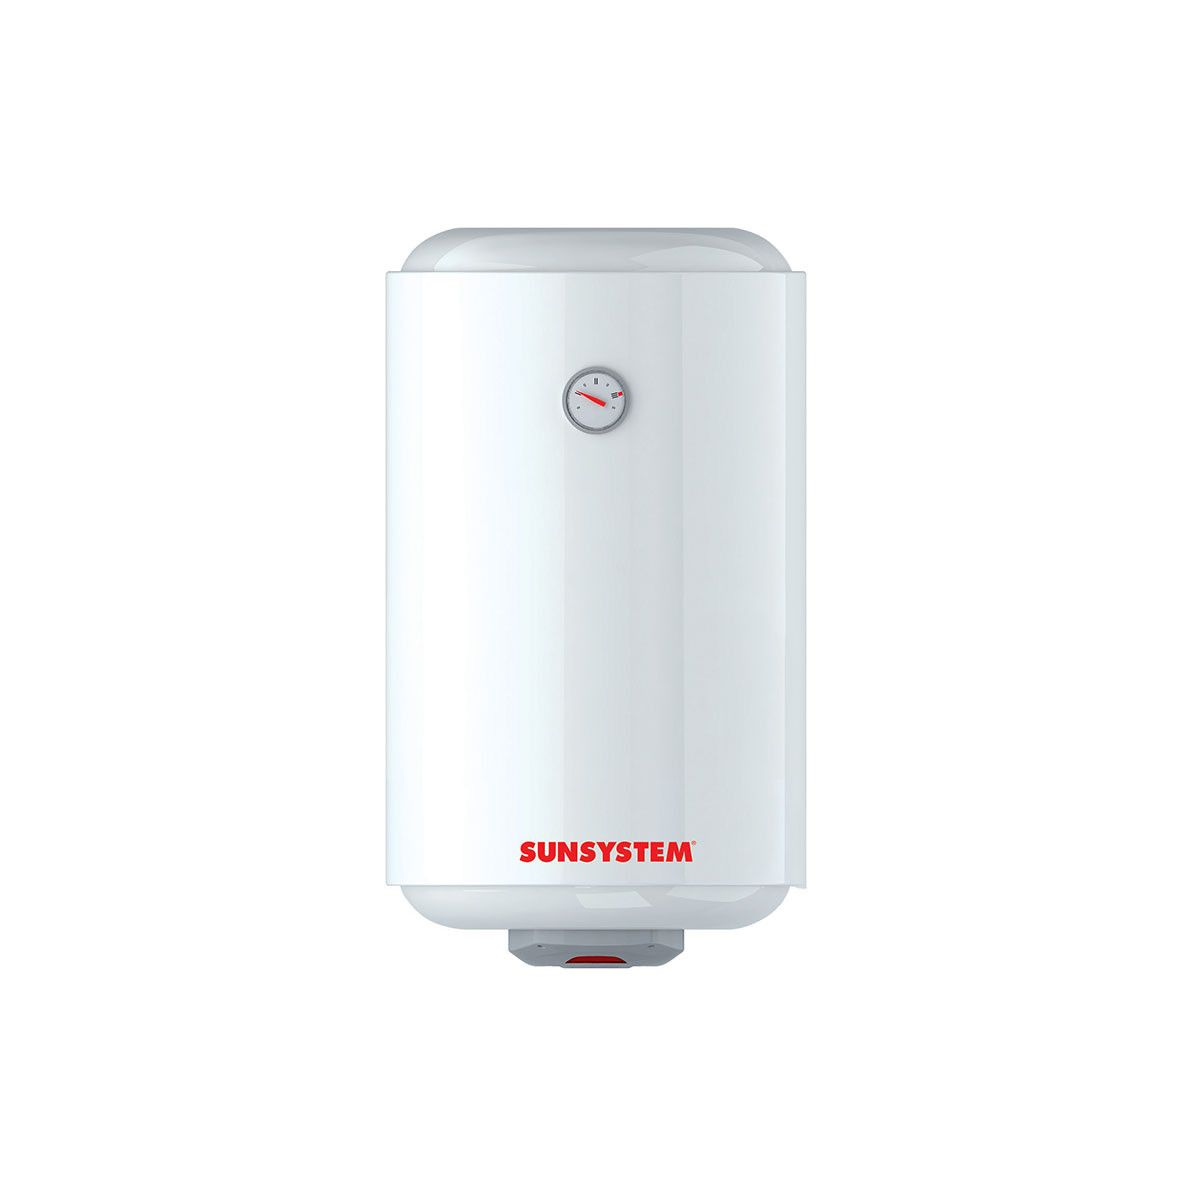 Boiler electric Sunsystem MB 80 Slim , 2000 W, 80 l, 0.8 Mpa, Izolatie termica, Protectie electrica IPX3, Reglaj extern de temperatura imagine fornello.ro